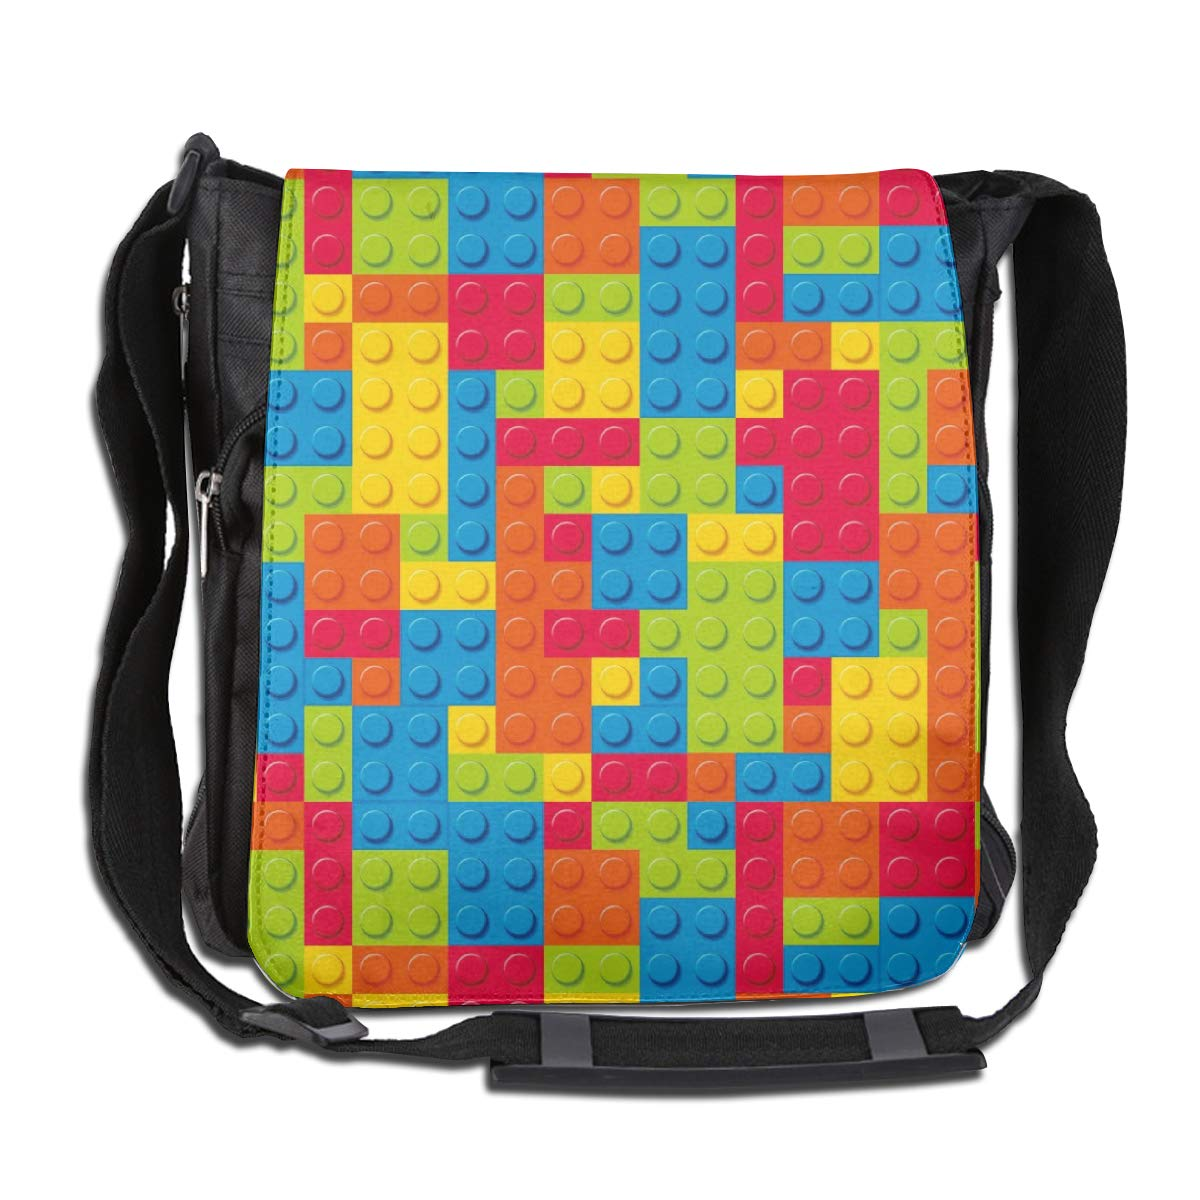 Jigsaw Puzzle Men Women Classic Satchel Messenger Bags Crossbody Sling Working Bag Travel Shoulder Bags Office//School